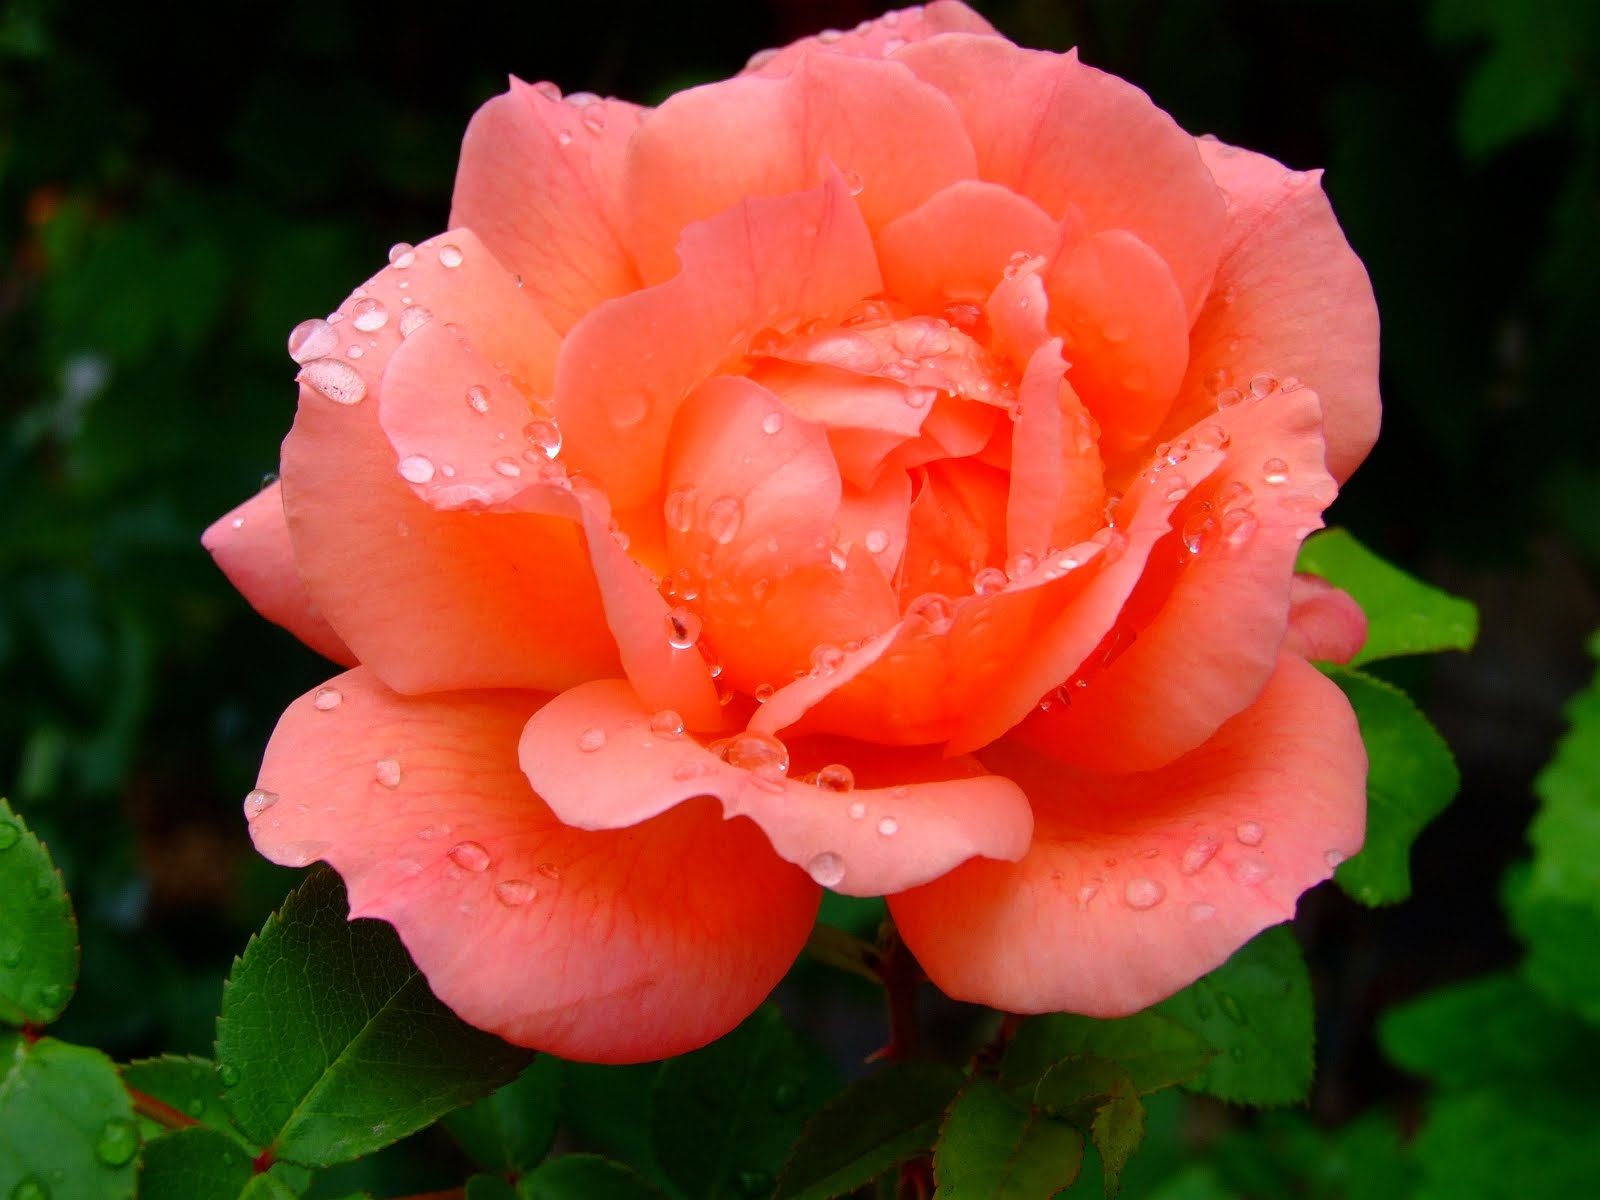 11 Dozen Wet Red Rose PSD Images